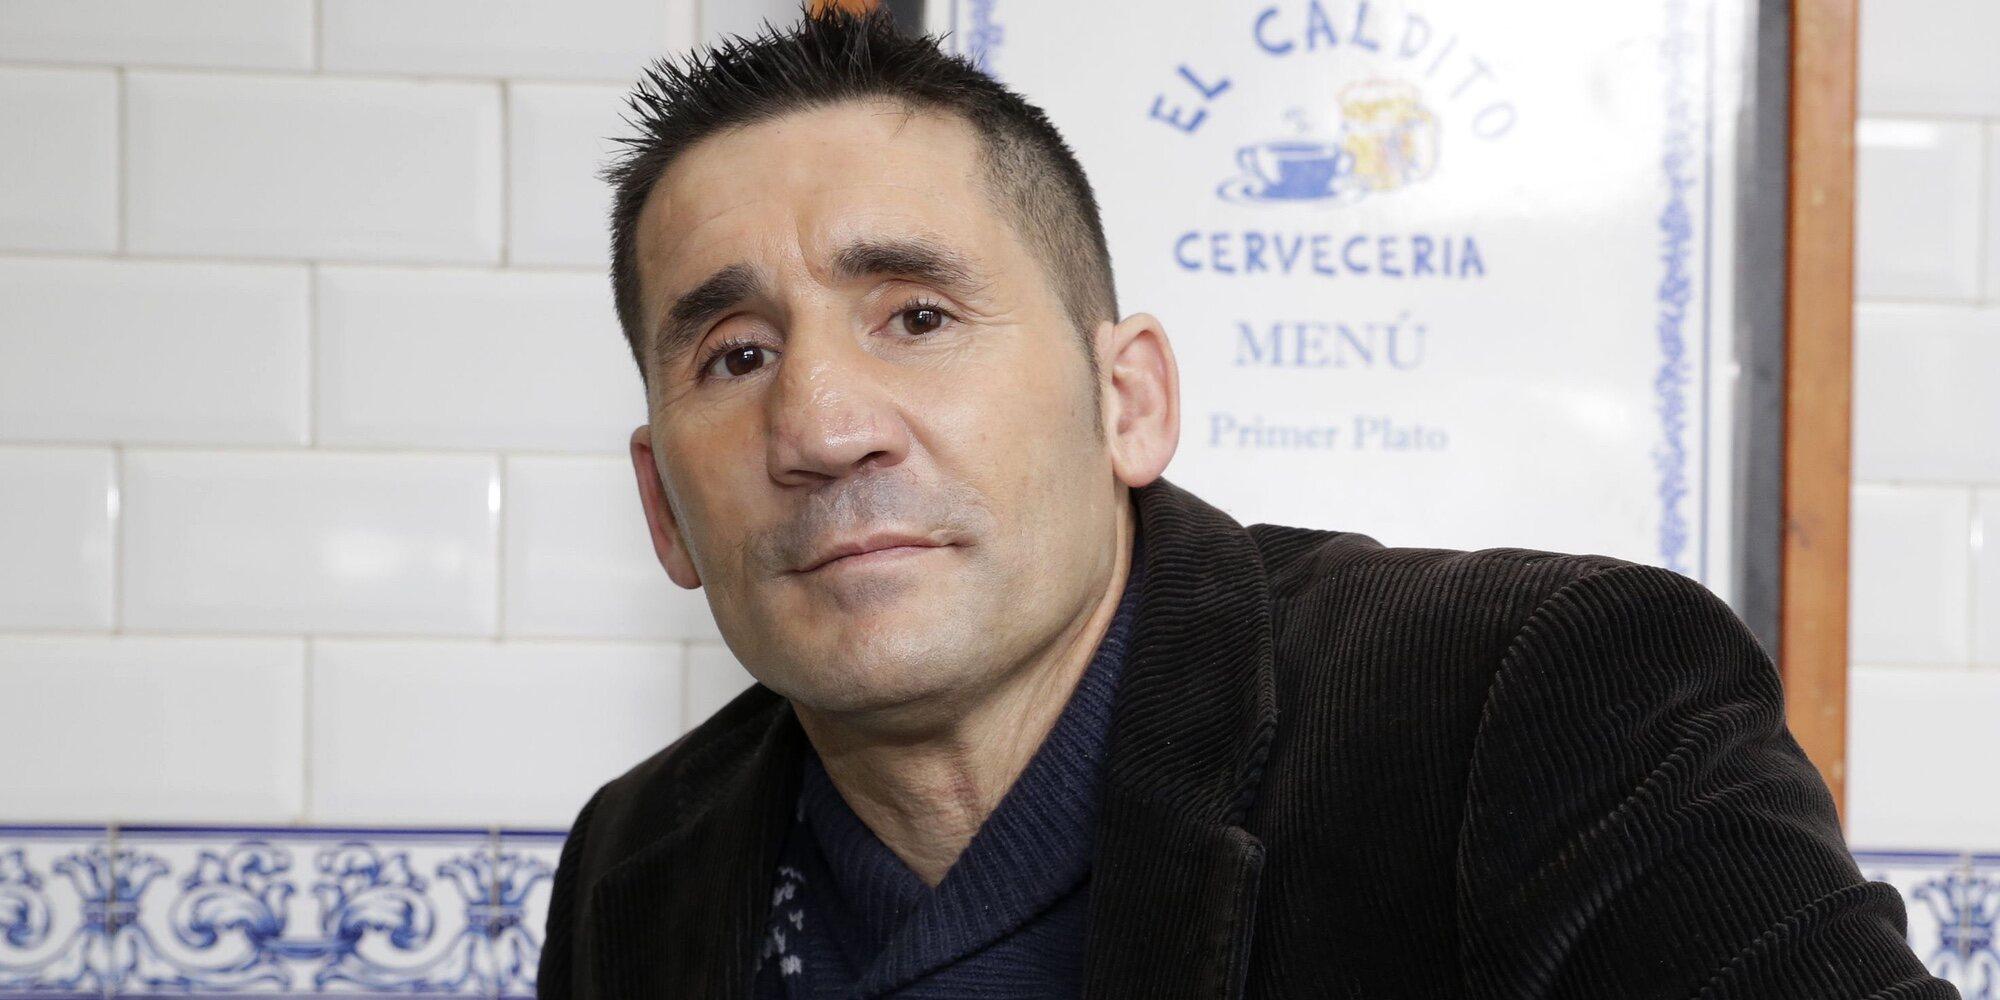 Poli Díaz, detenido por segunda vez en un mes por agredir a su pareja